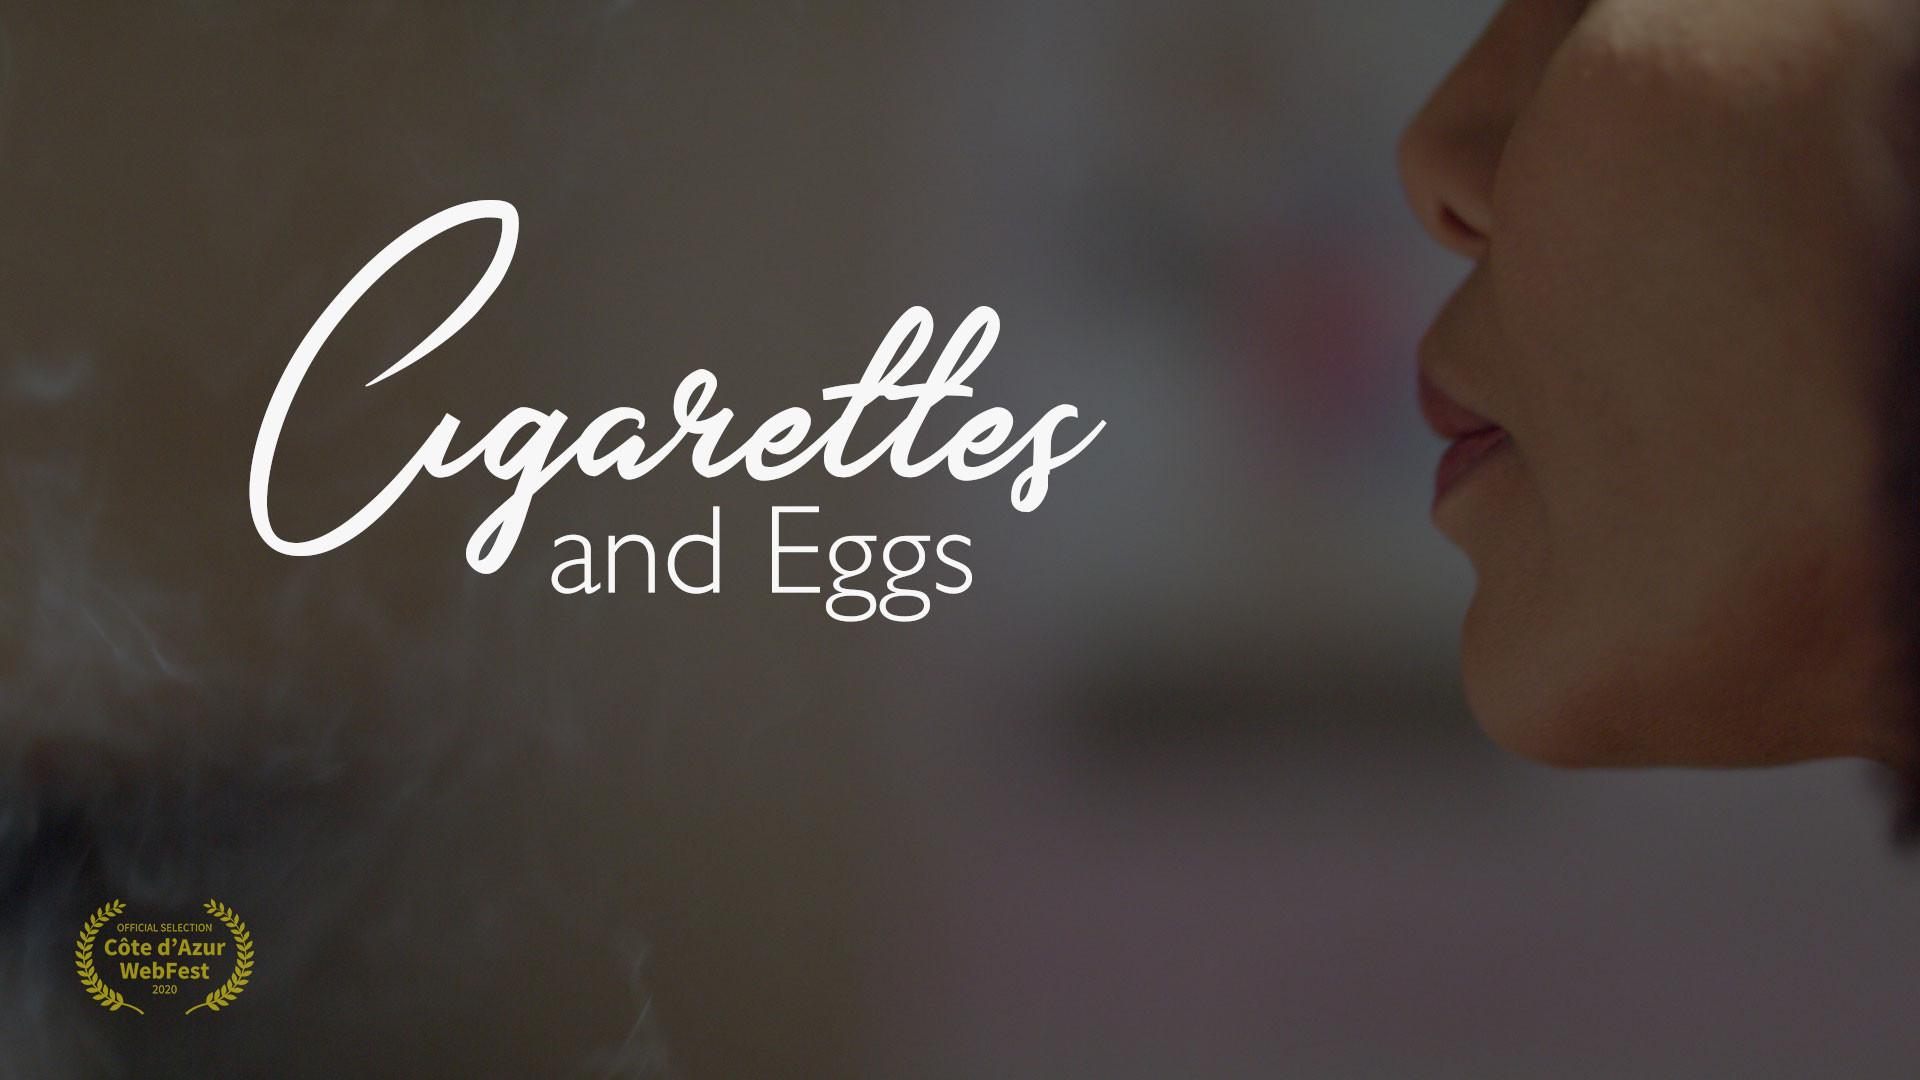 Cigarettes-and-Eggs-05